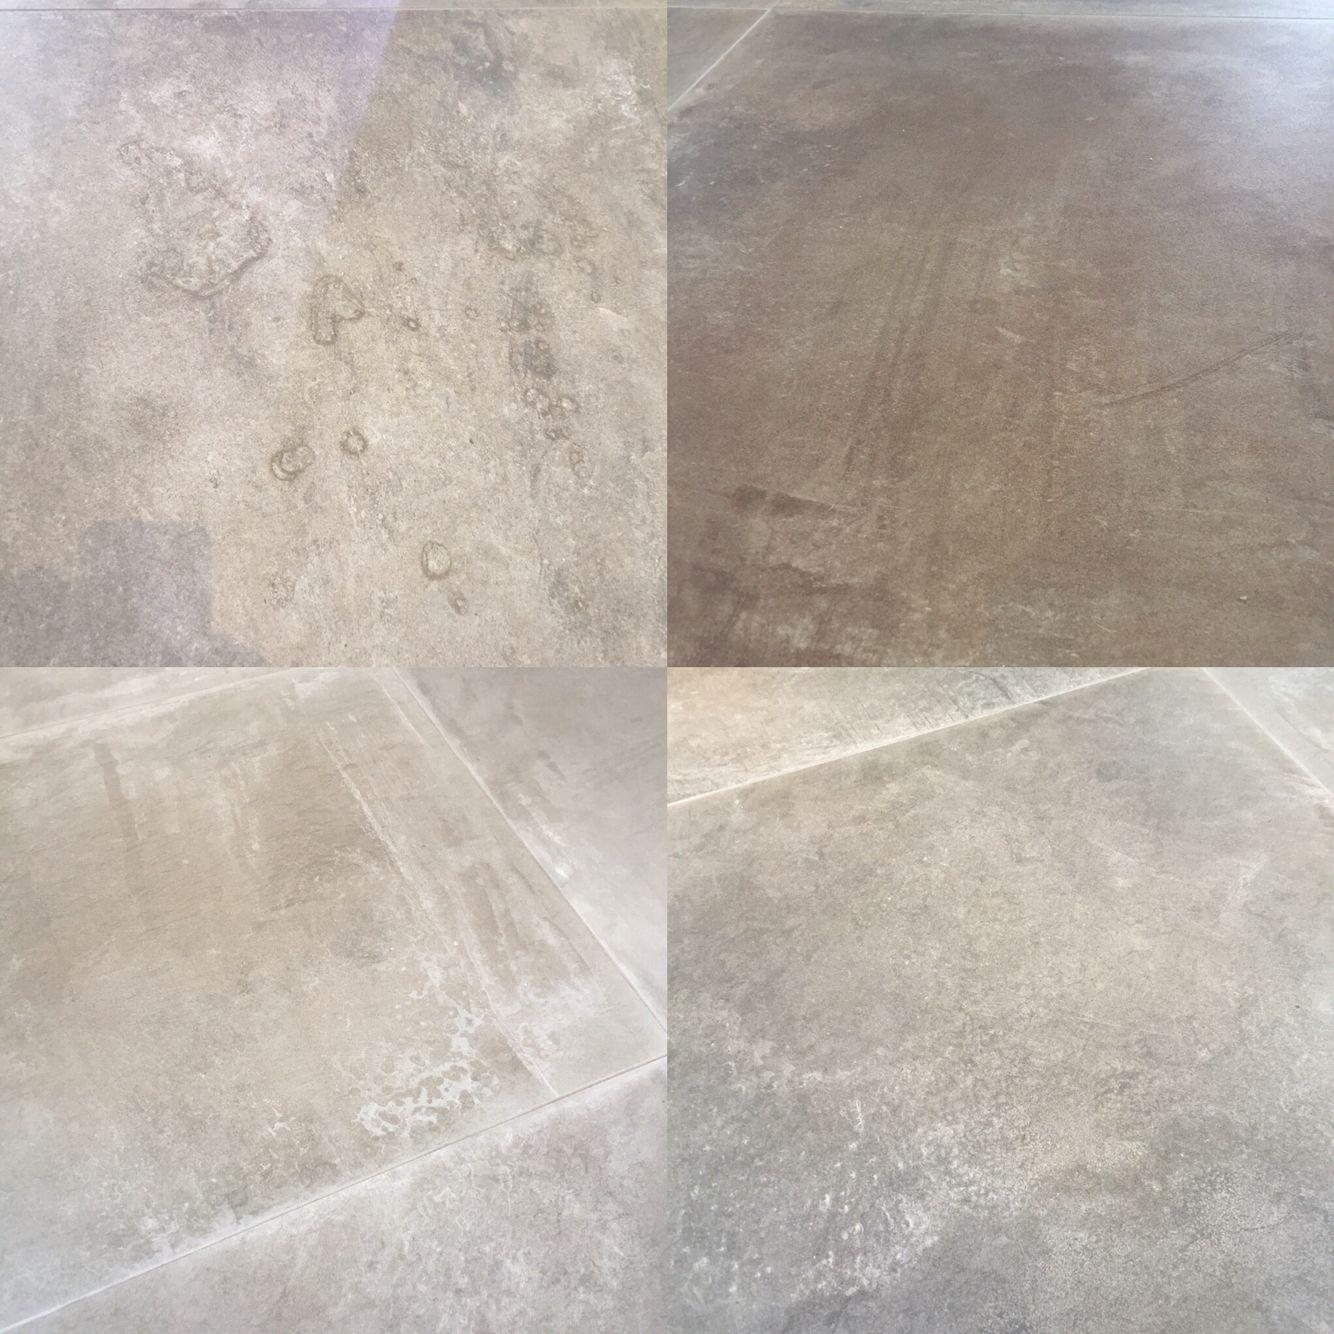 Provaenza dust betonlook vloertegels 80x80 cm betonlook - Betonlook wand ...